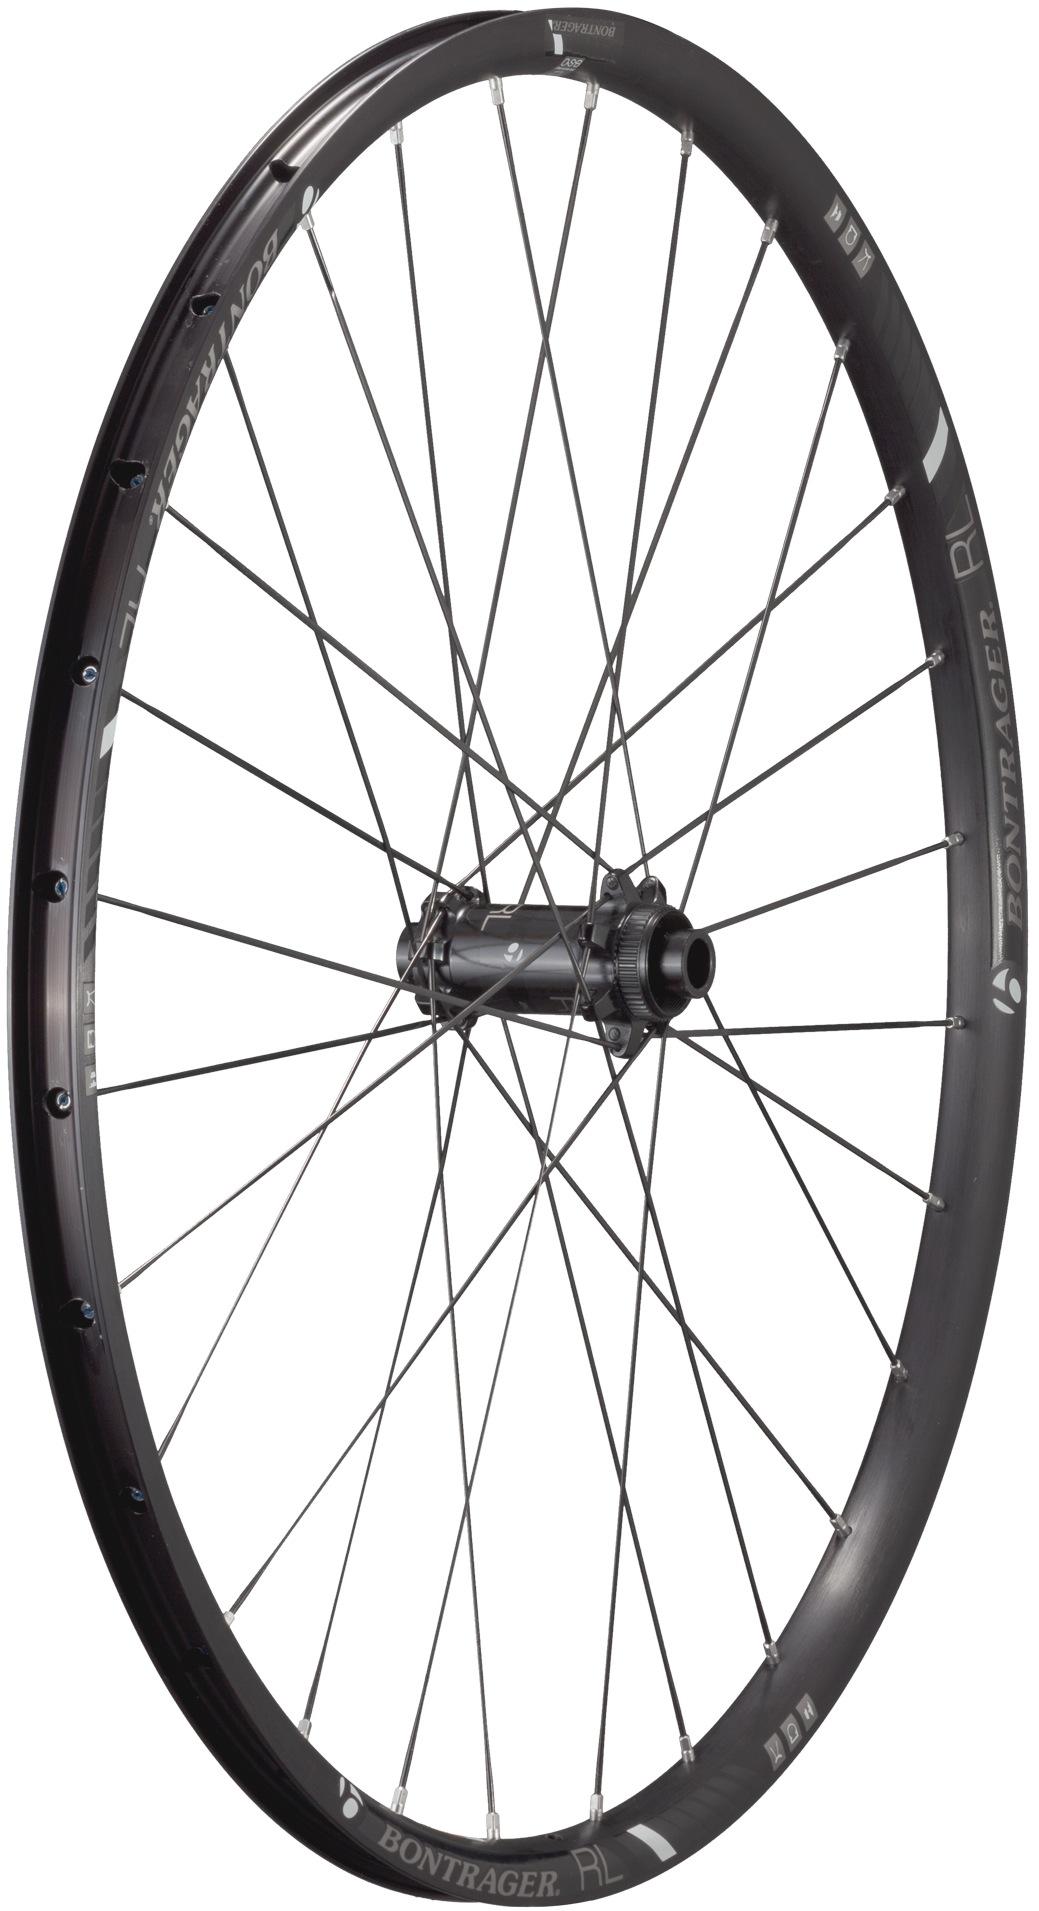 Bontrager Race Lite 26 Quot Tlr Disc Mtb Wheel Mtb Wheels